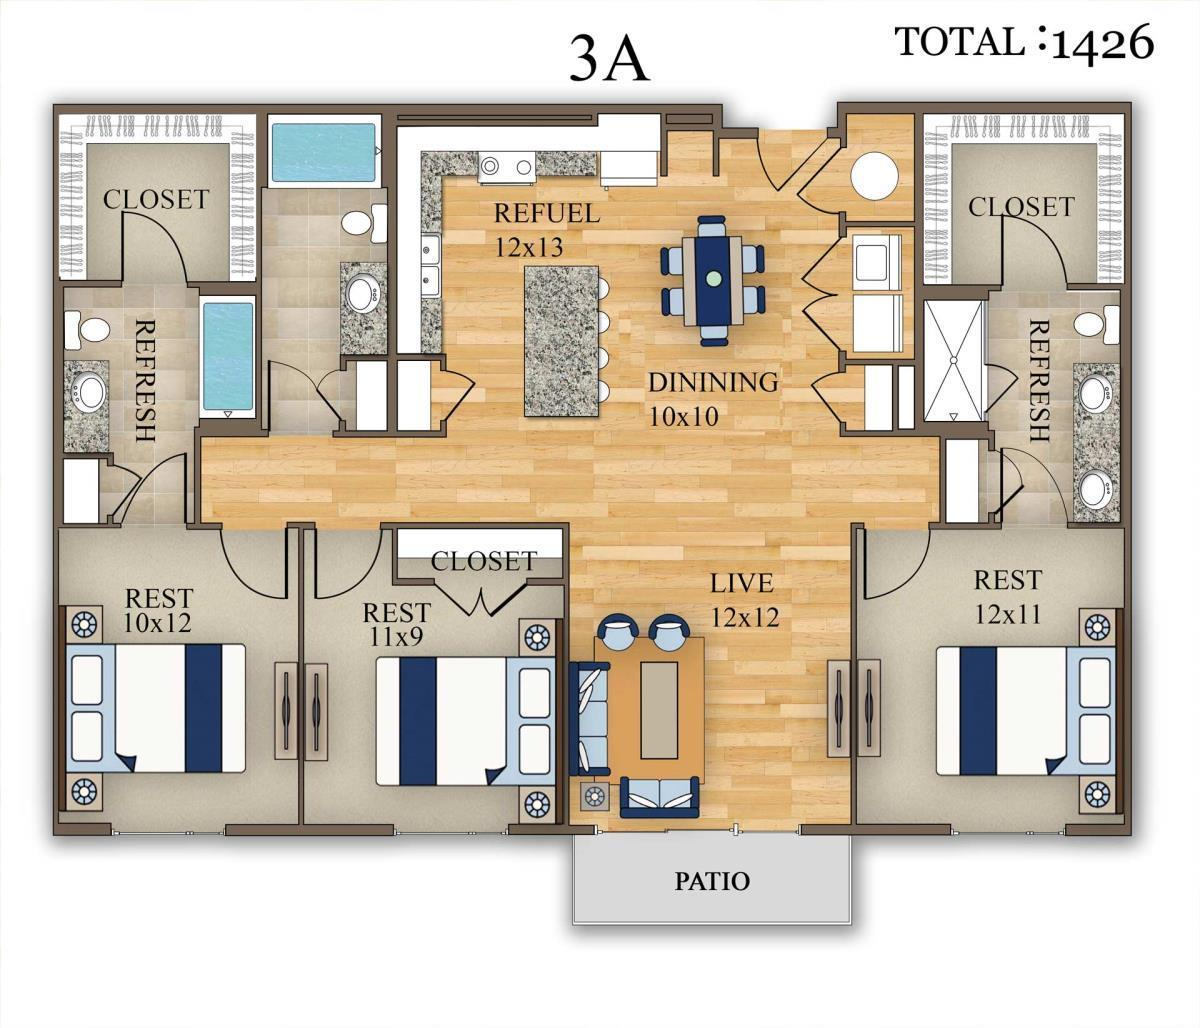 1,426 sq. ft. 3A floor plan